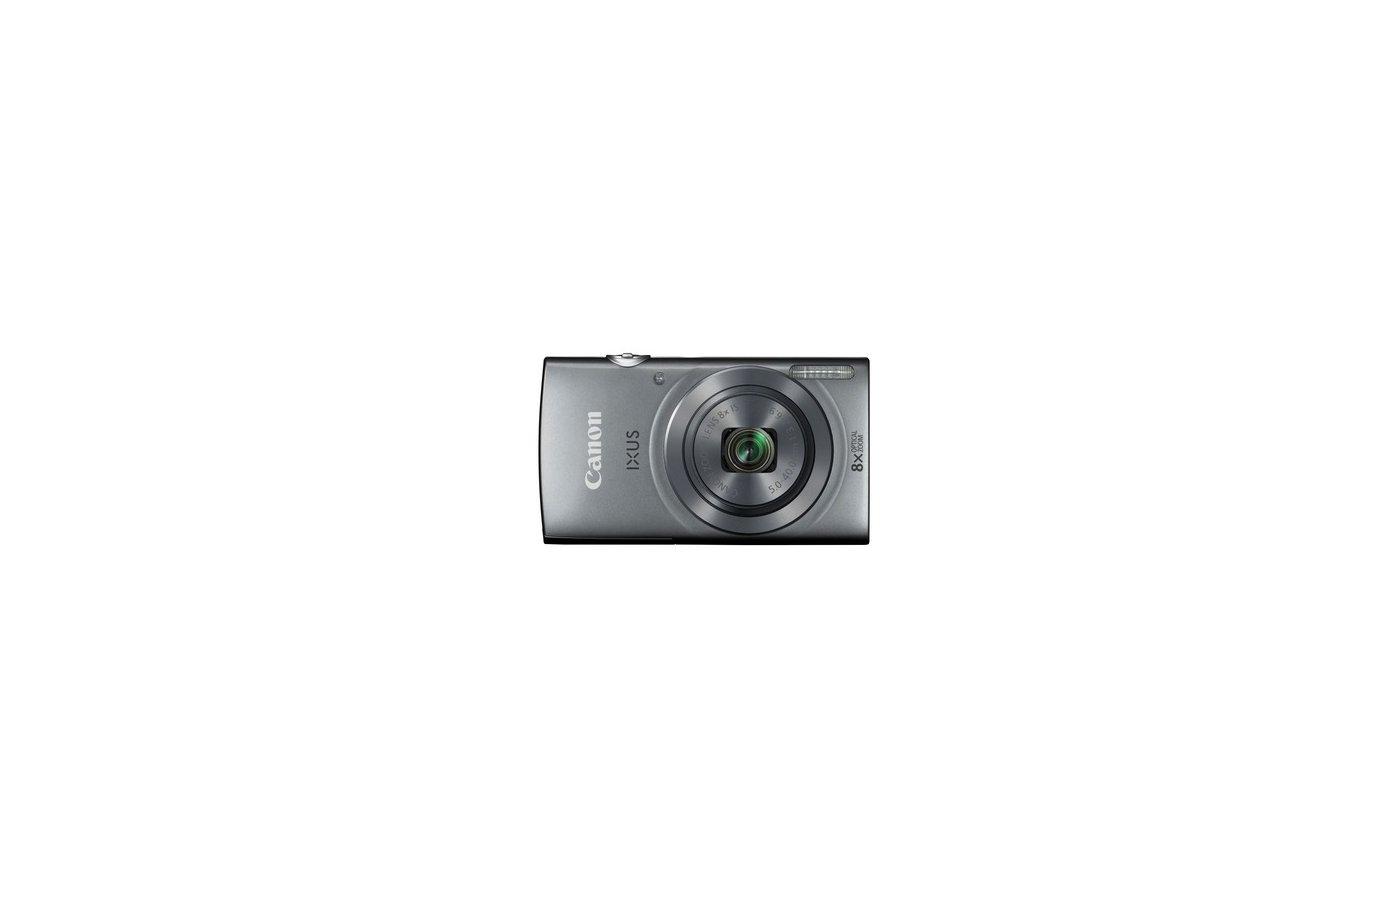 Фотоаппарат компактный CANON IXUS 165 silver